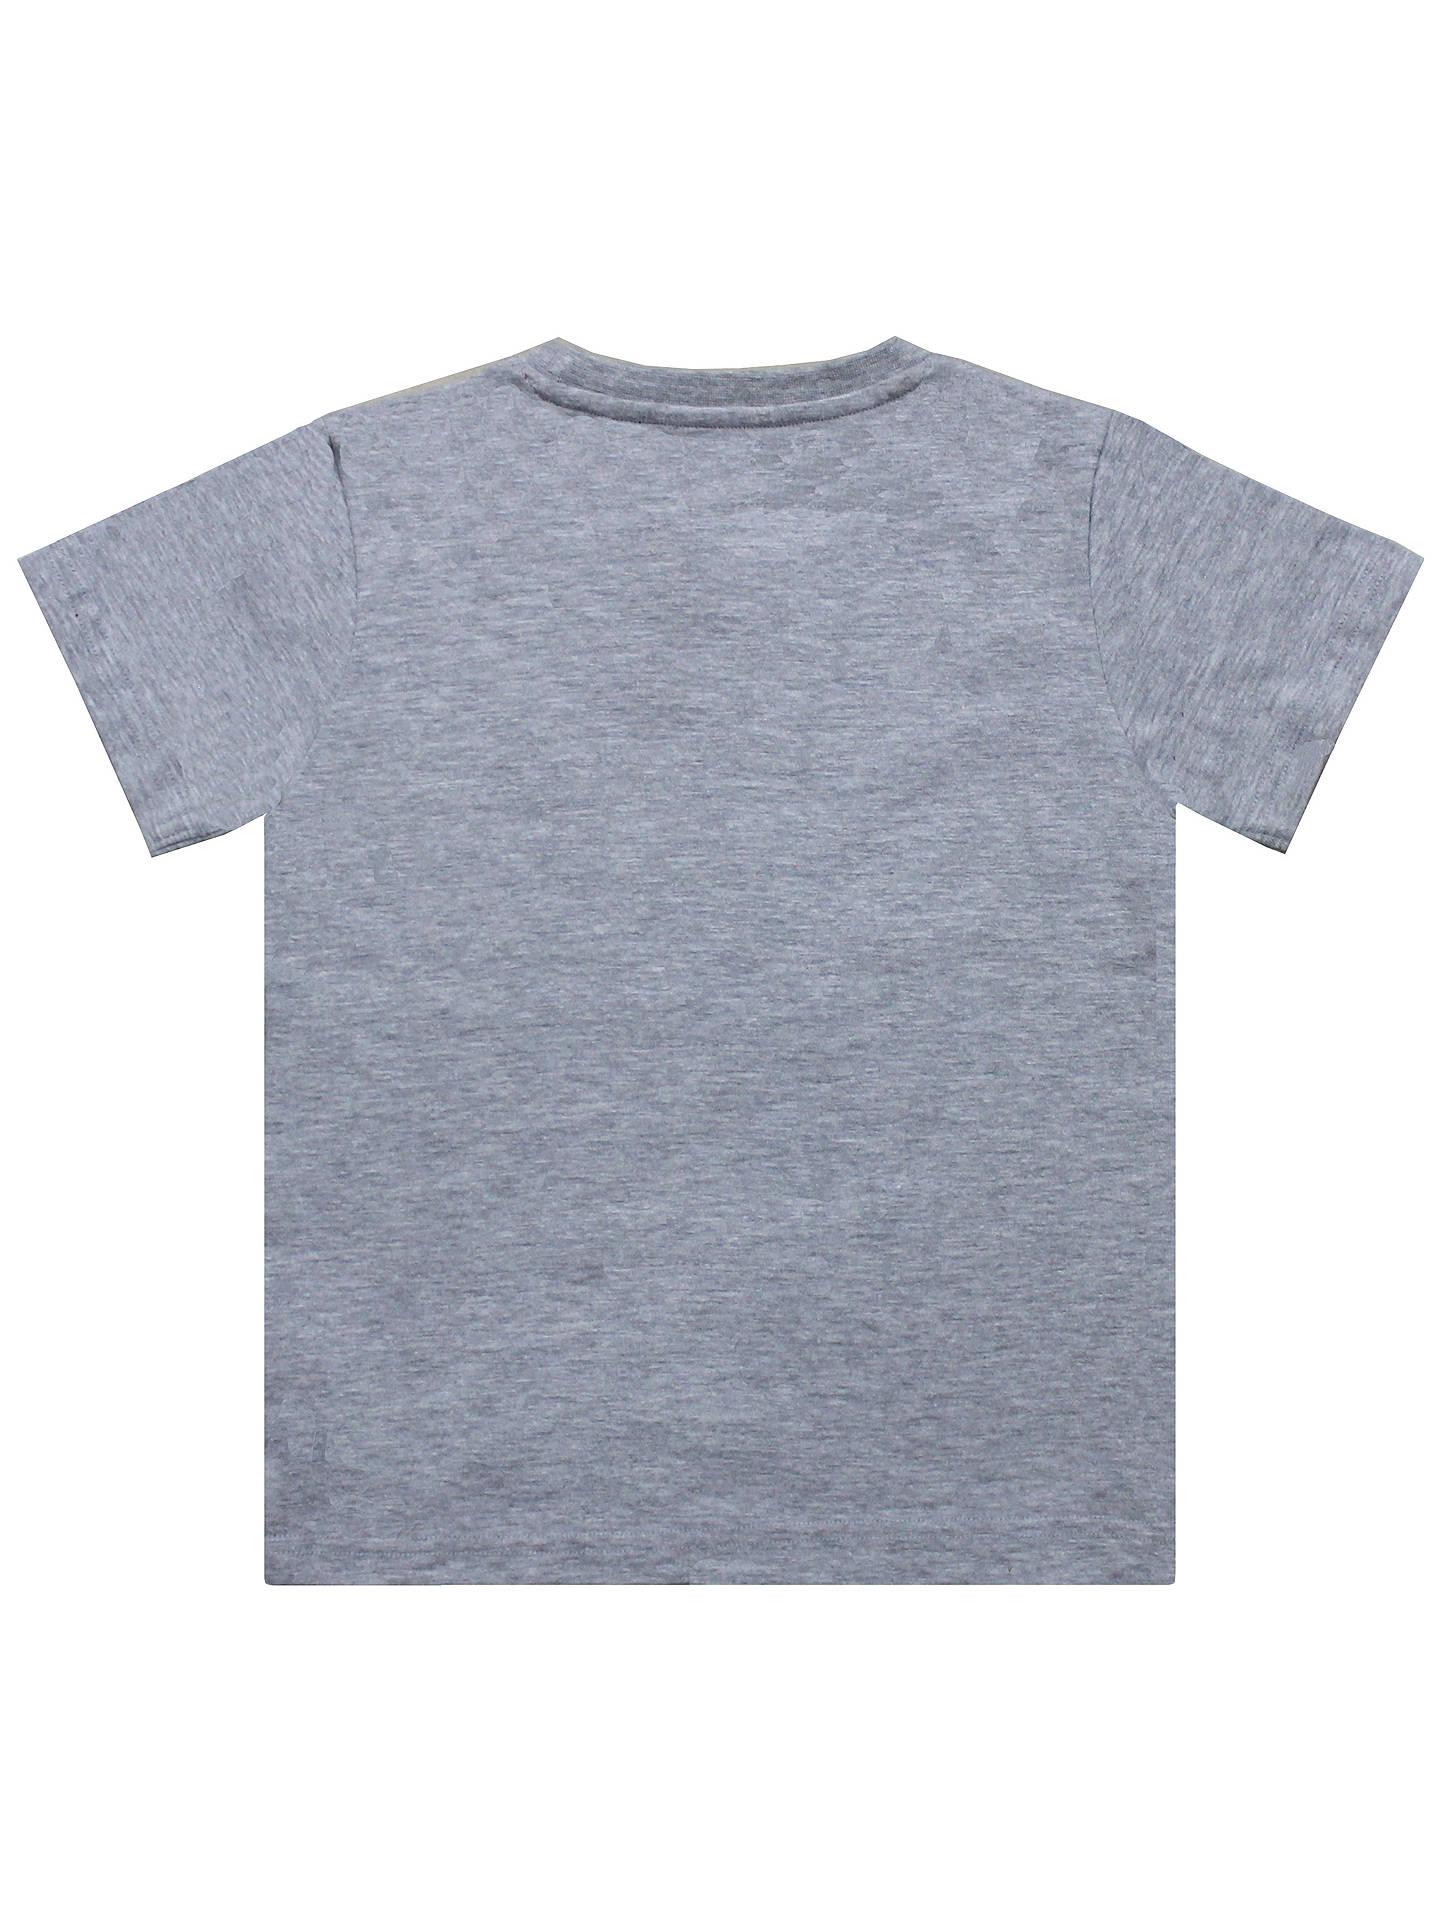 a0b380d0 ... Buy Marvel Children's Spider-Man Short Sleeve T-Shirt, Grey, 3-